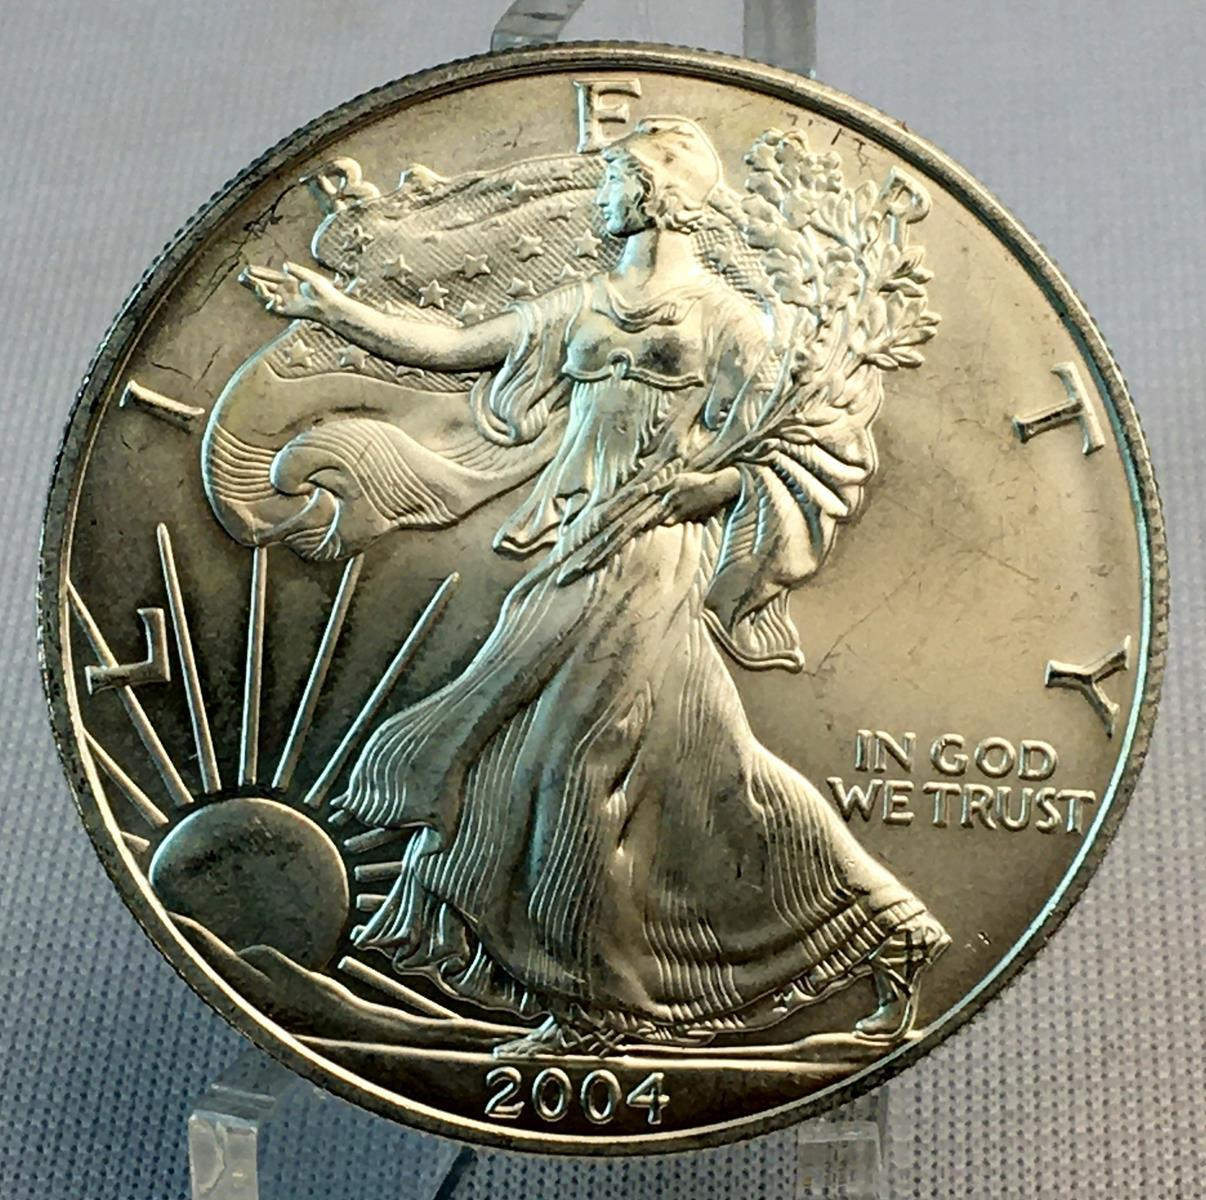 2004 American $1 Silver Eagle UNCIRCULATED